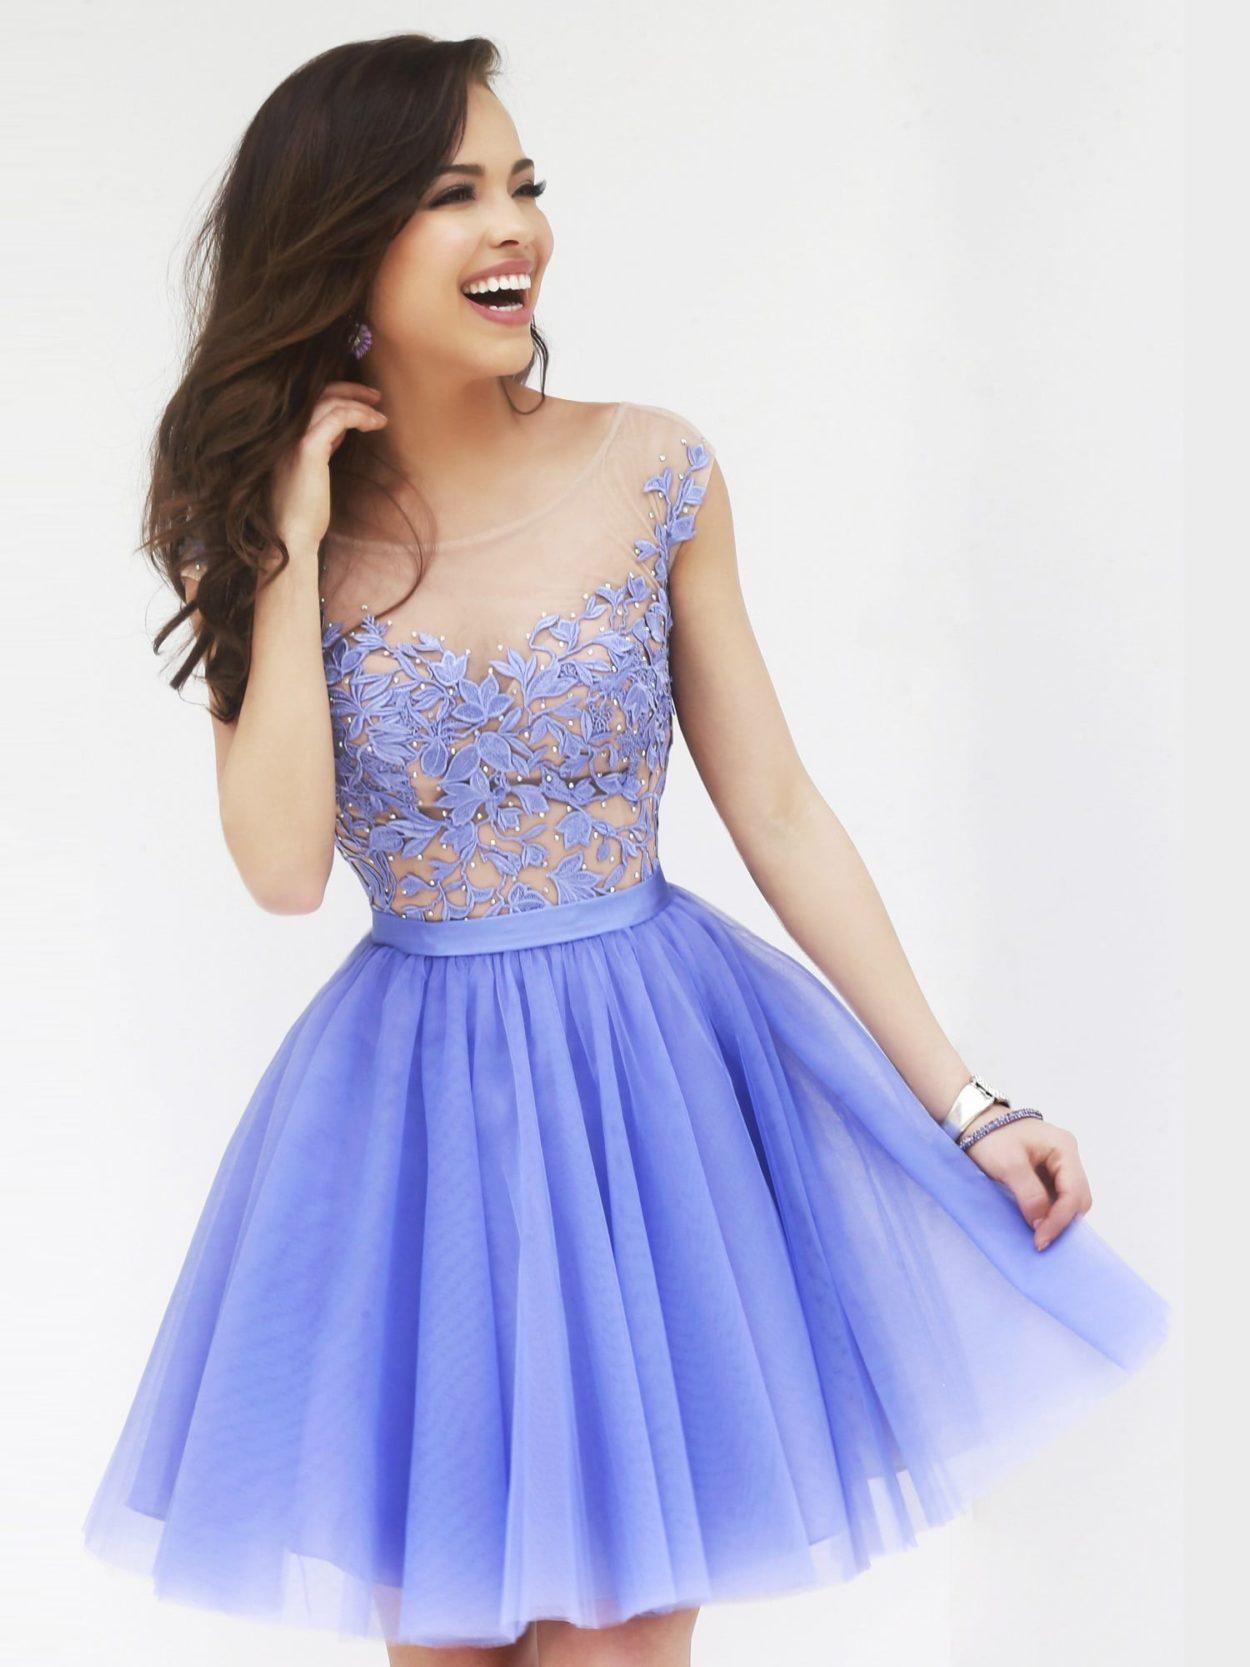 a8740f6bf73 Короткое фиолетовое выпускное платье Sherri Hill 11171 Periwinkle ...